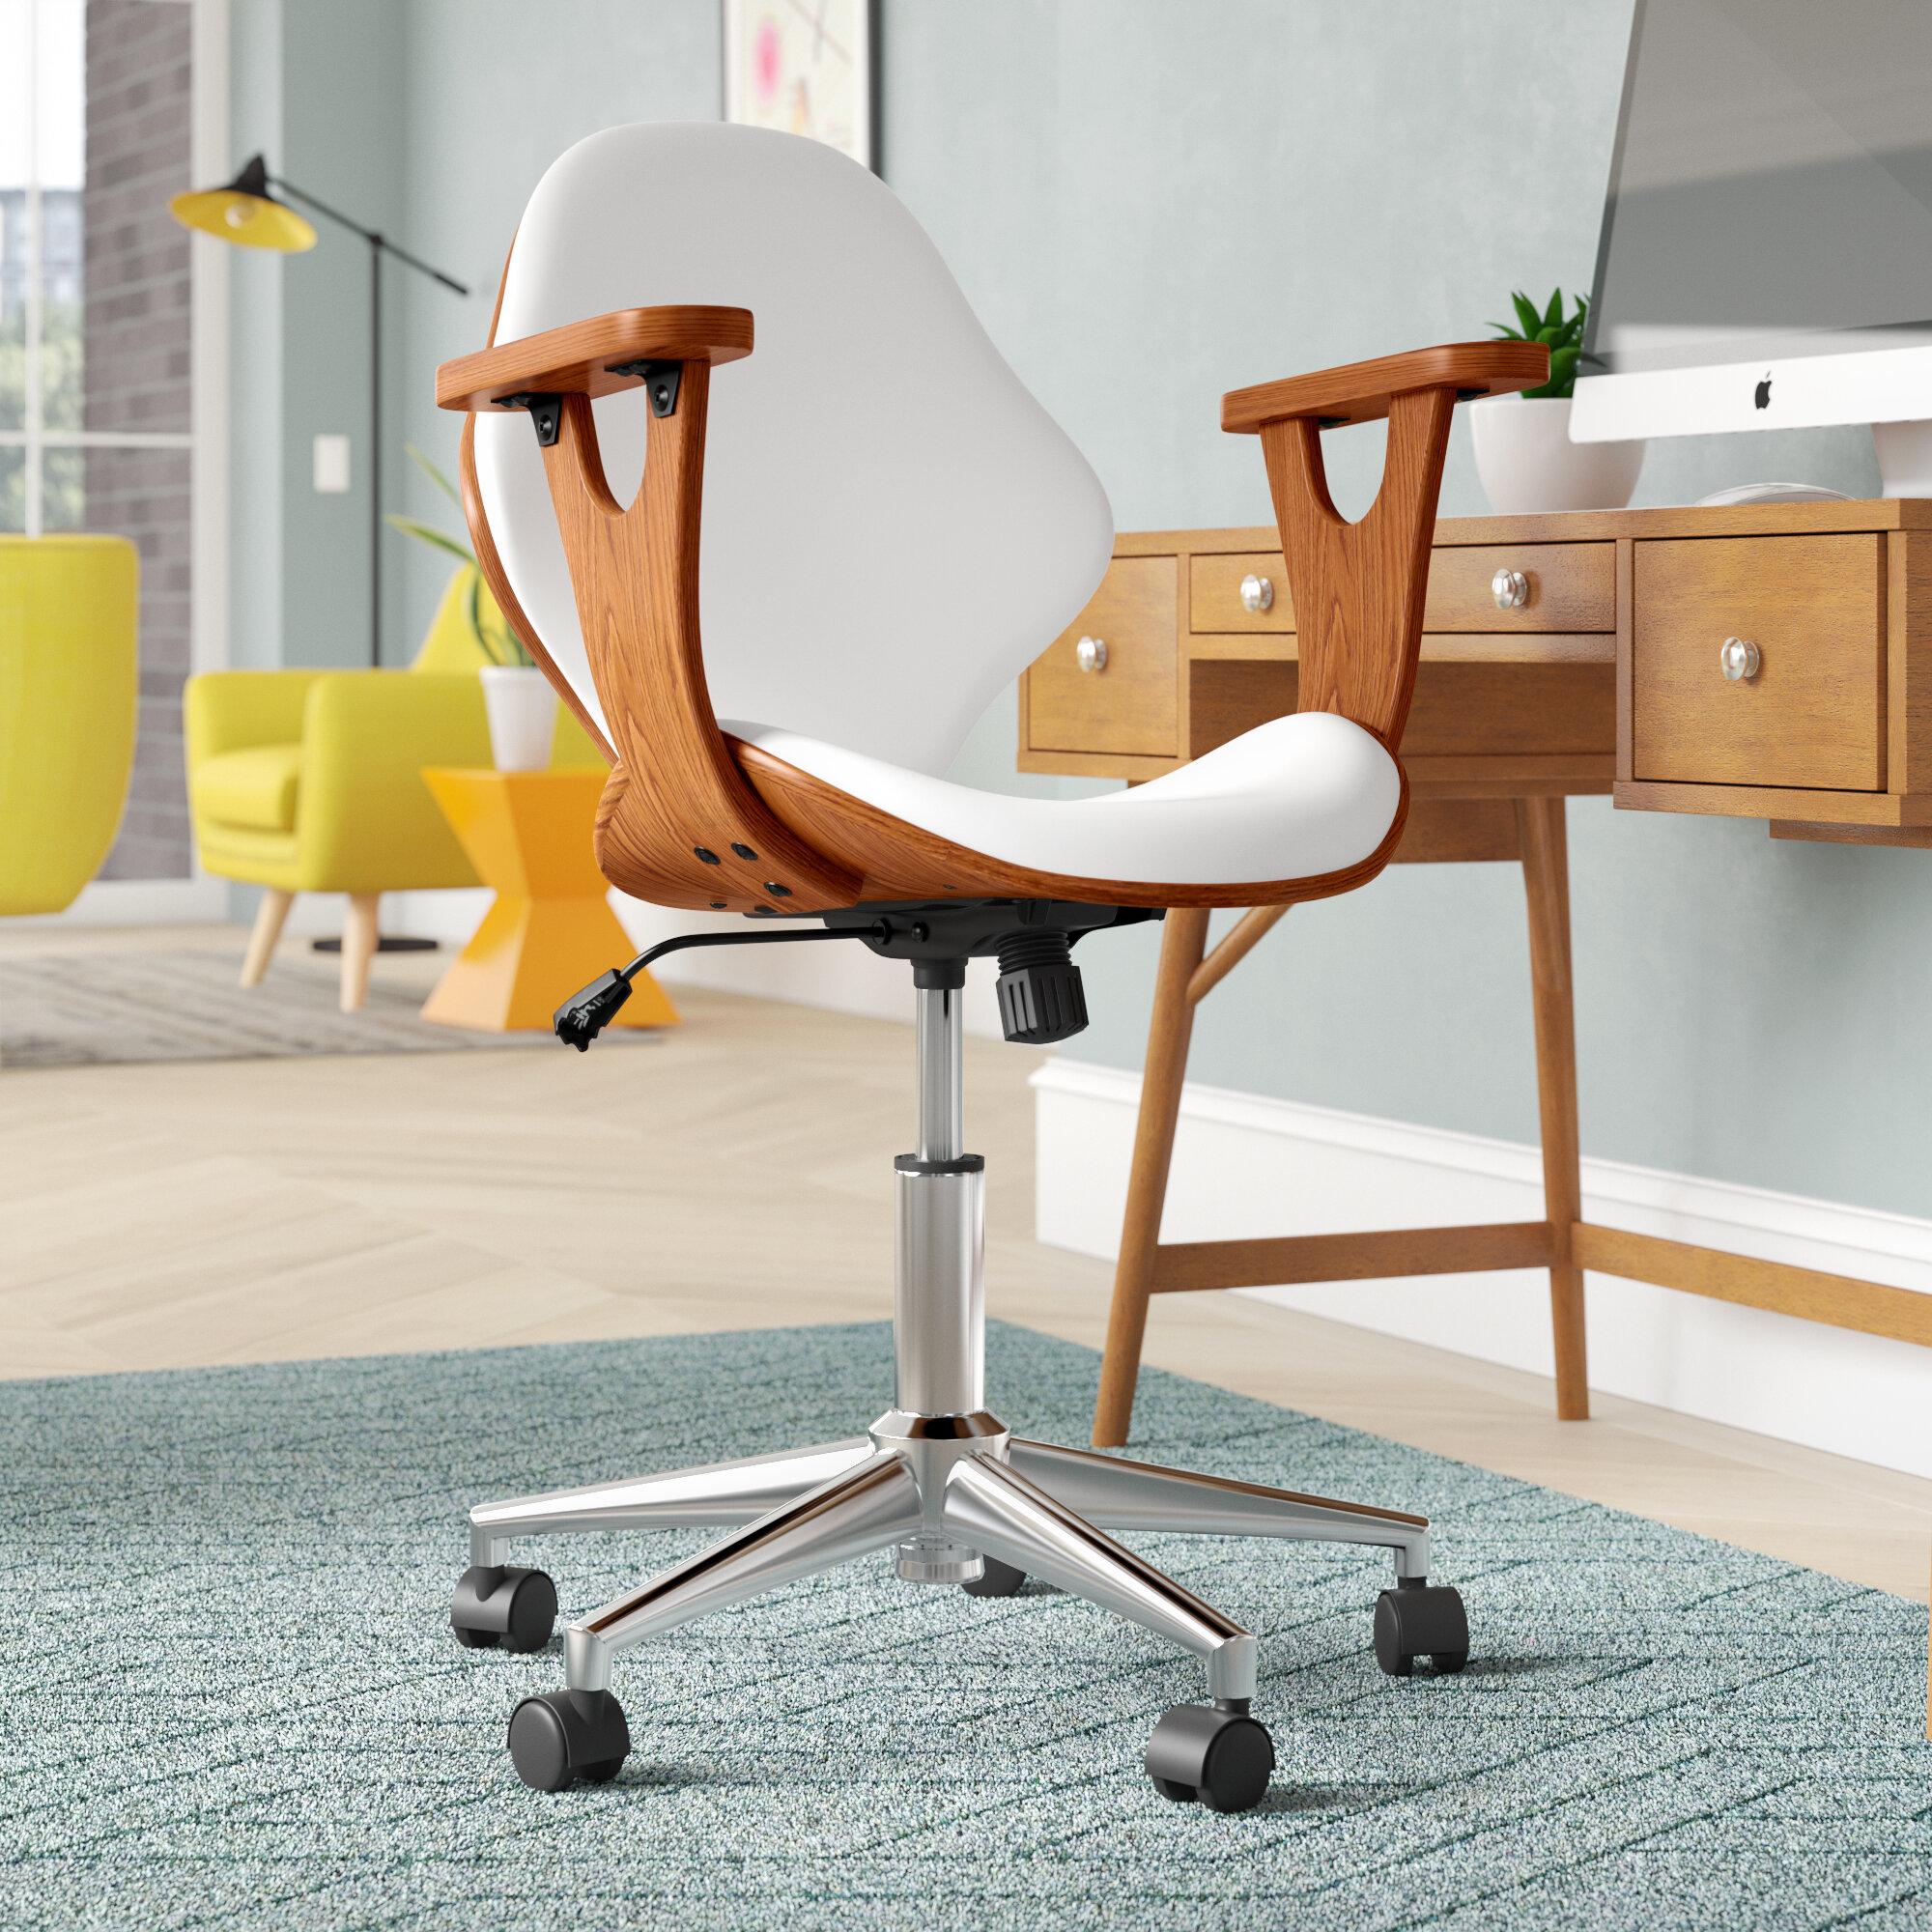 Mid Century Modern Office Chairs Desks You Ll Love In 2021 Wayfair